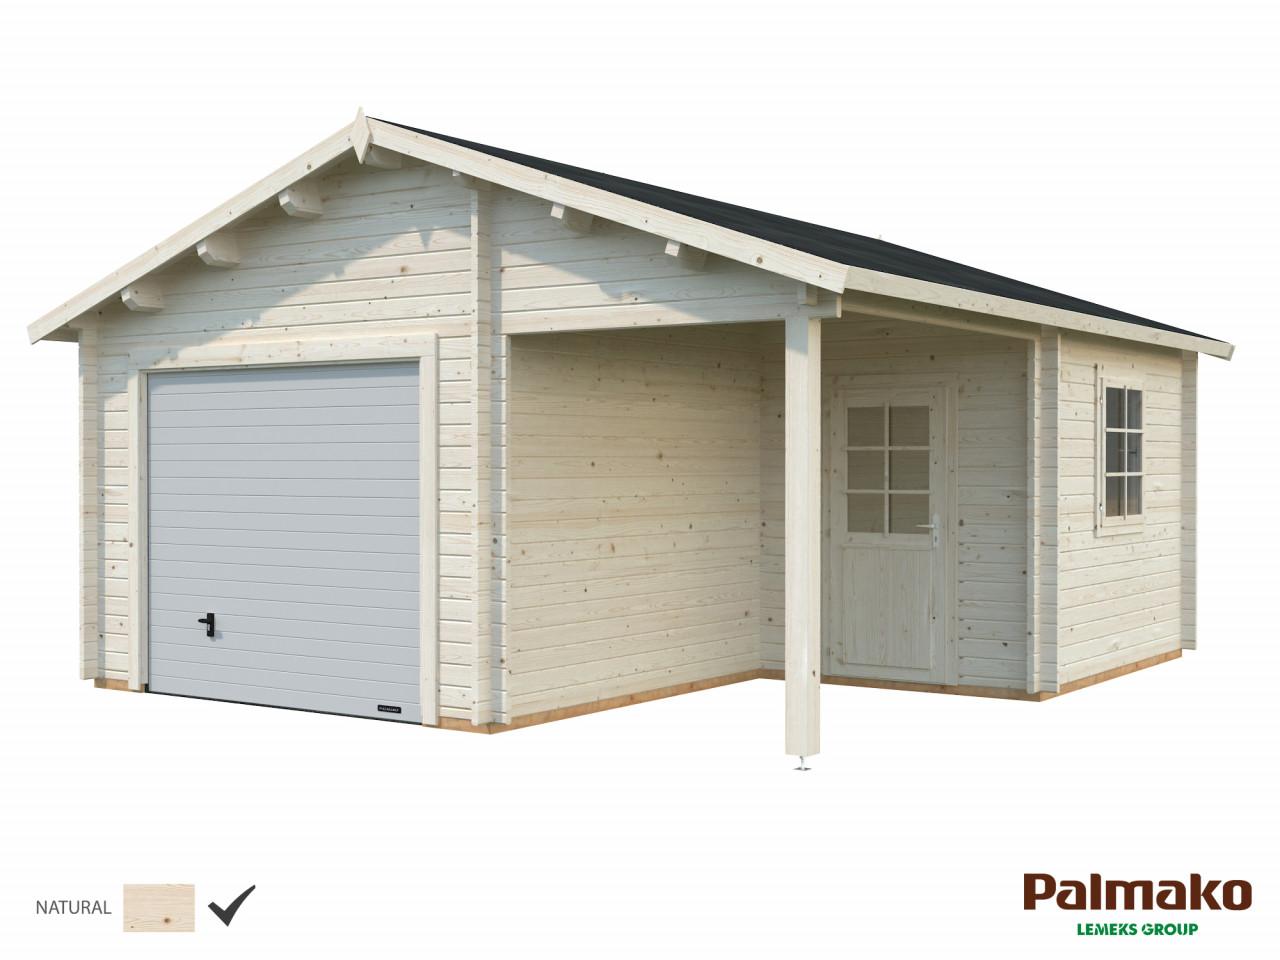 Palmako Holzgarage Roger 21,9+5,2 m²mit Sektionaltor